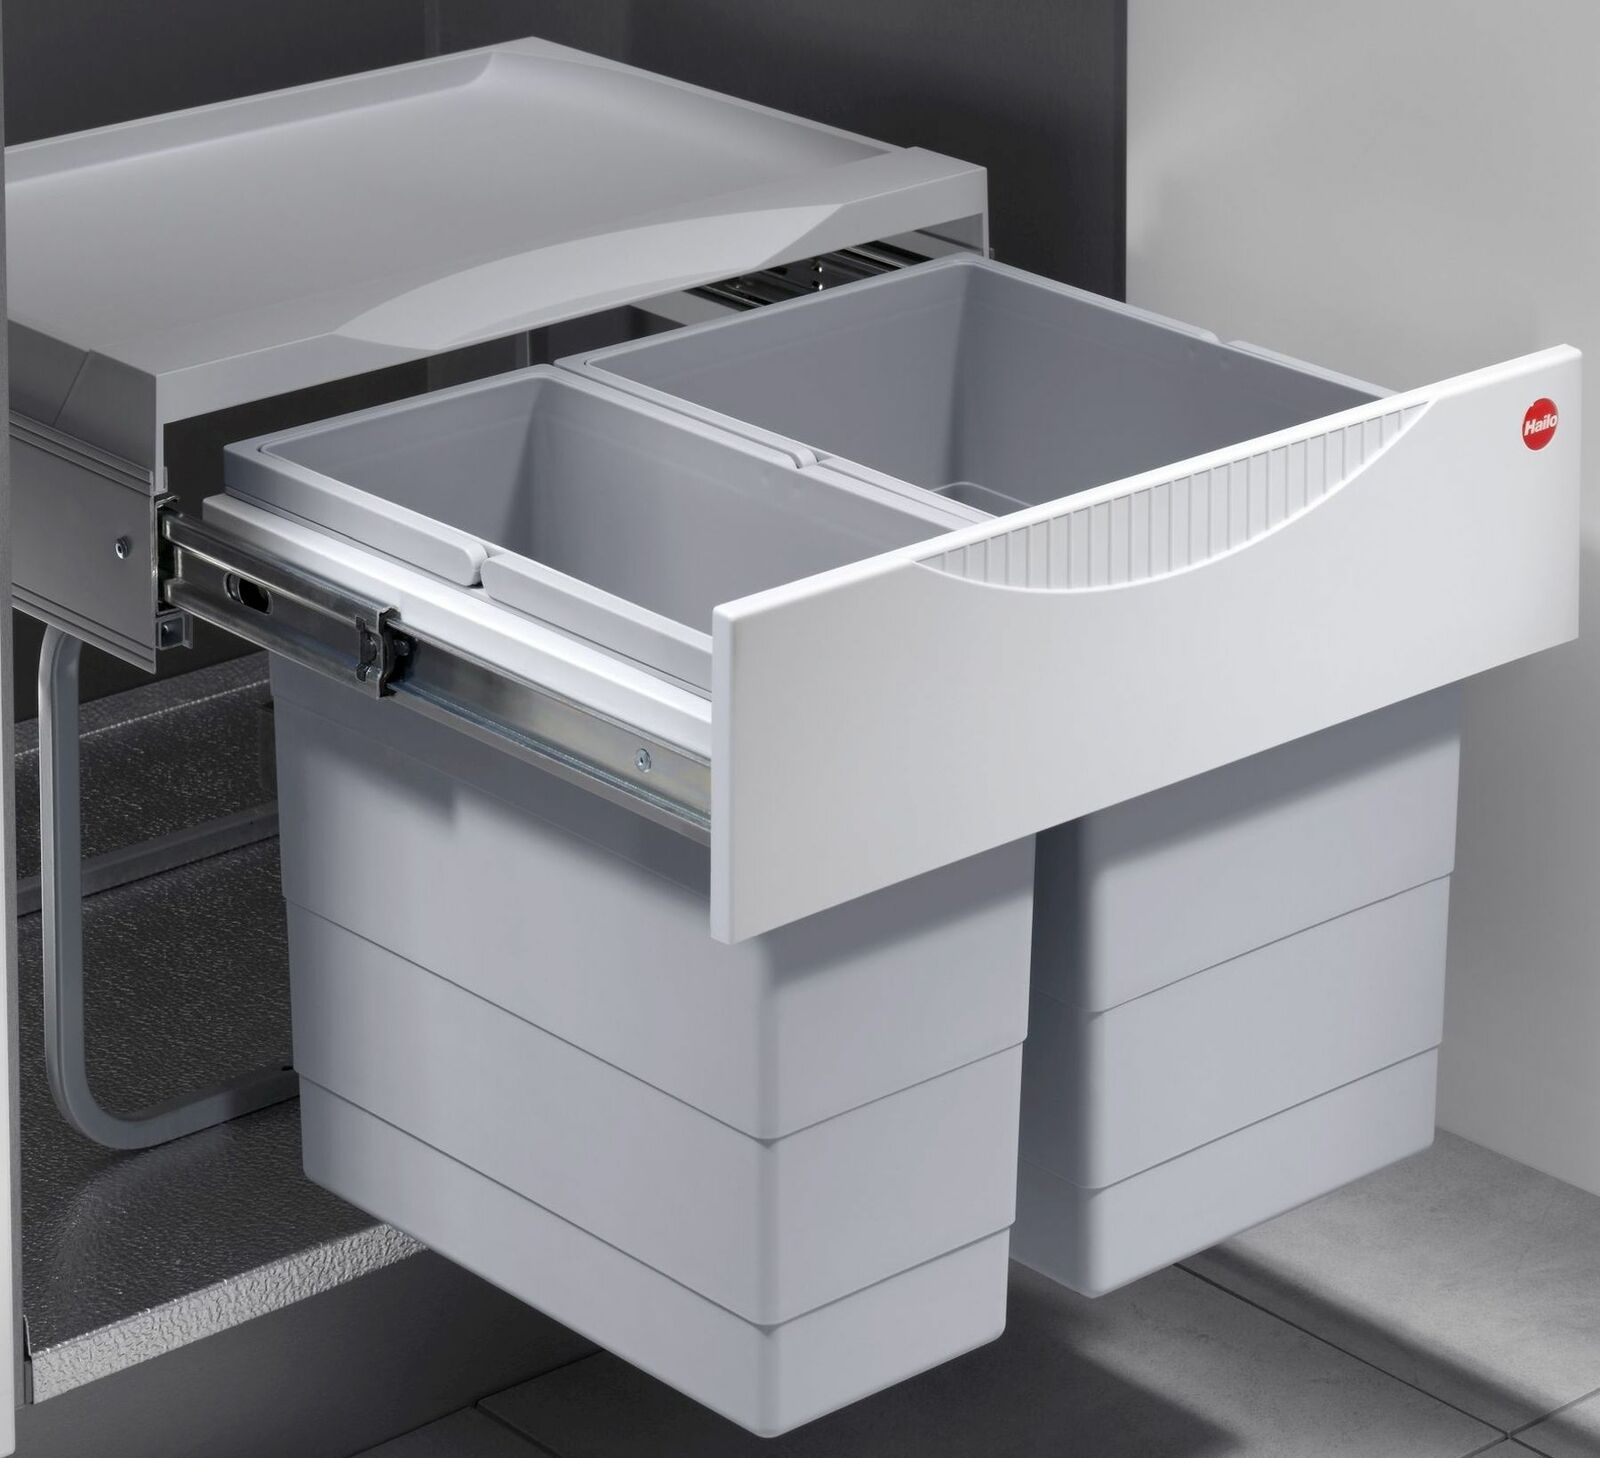 Mülleimer Küche 20 Liter Hailo Einbau Abfalleimer Müllsammler Müllsystem  *20